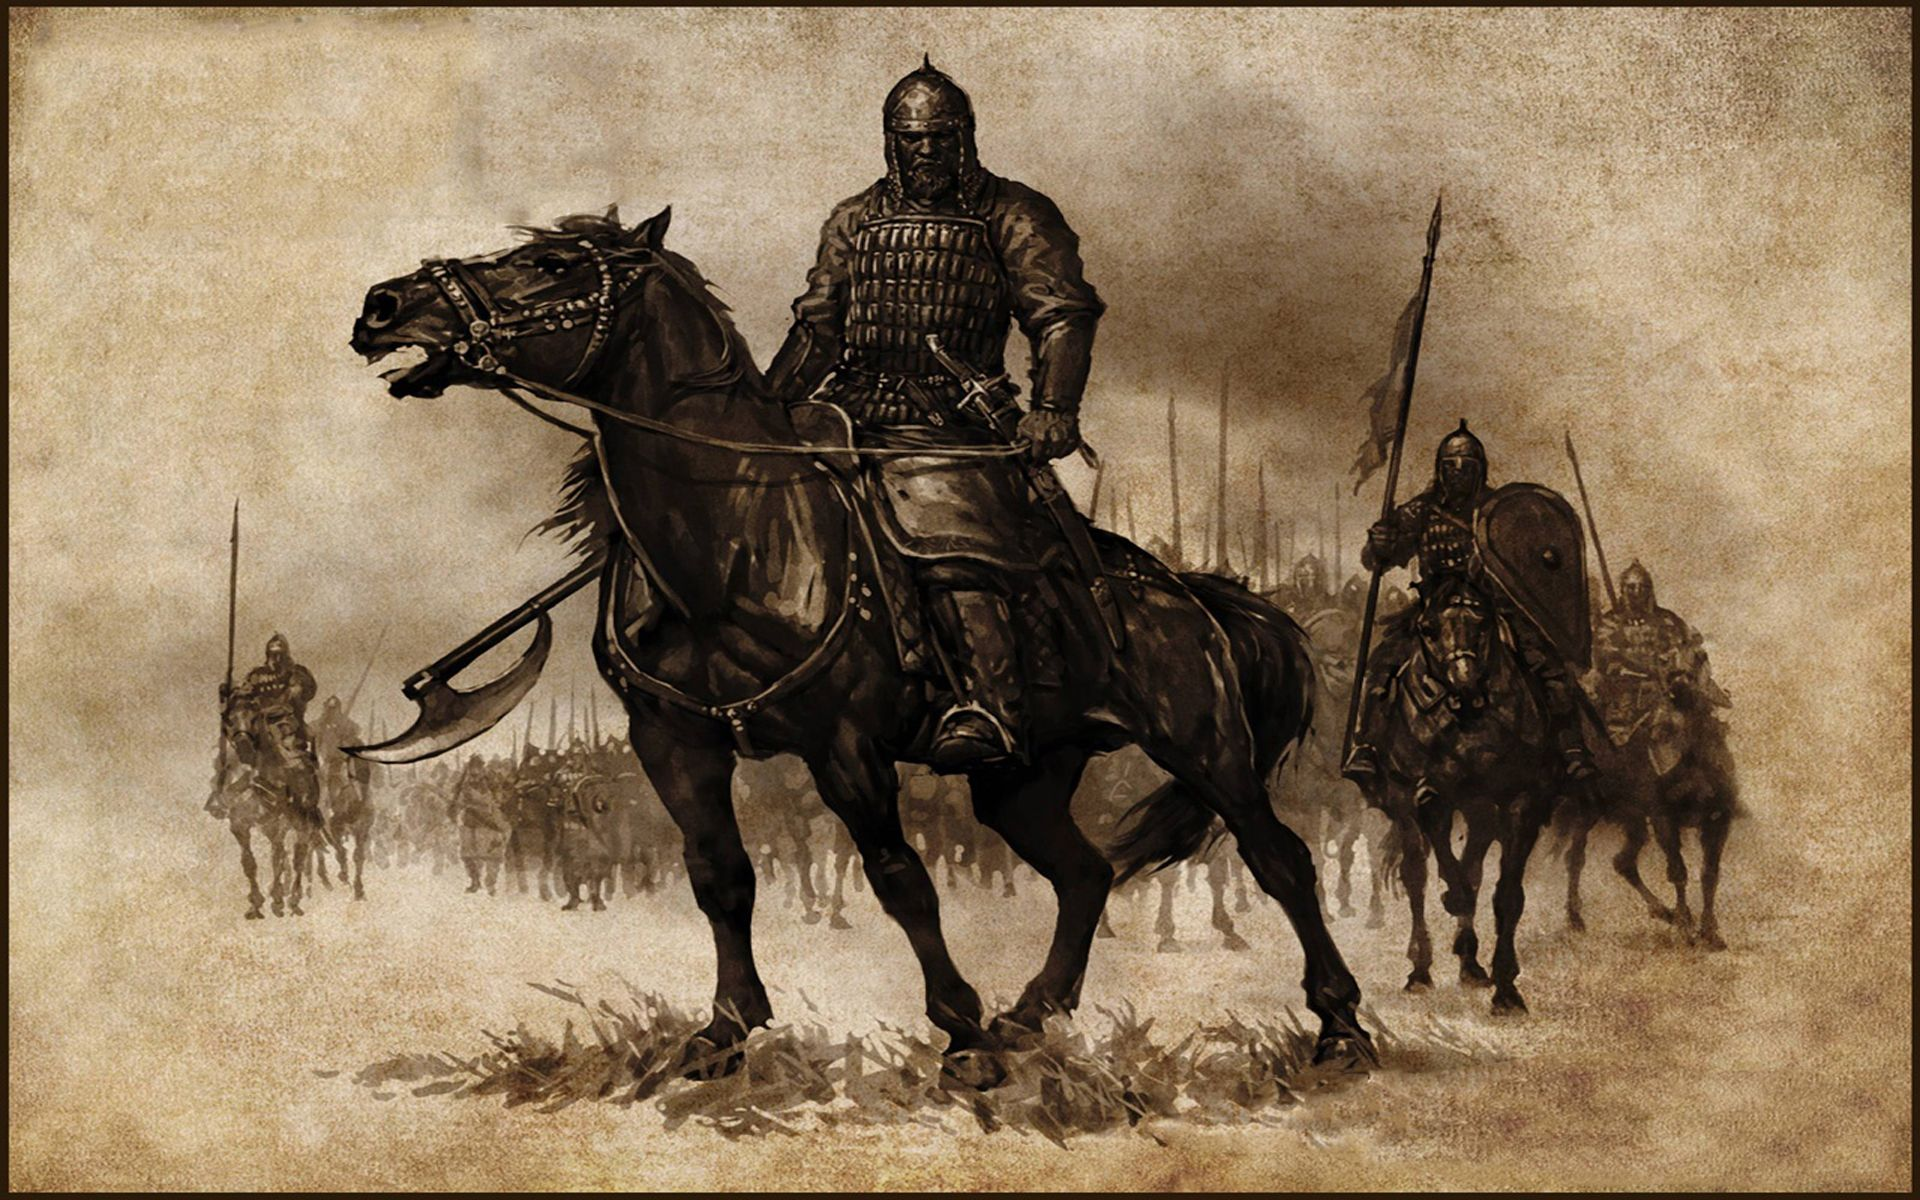 Knight In Shining Armor Silhouette